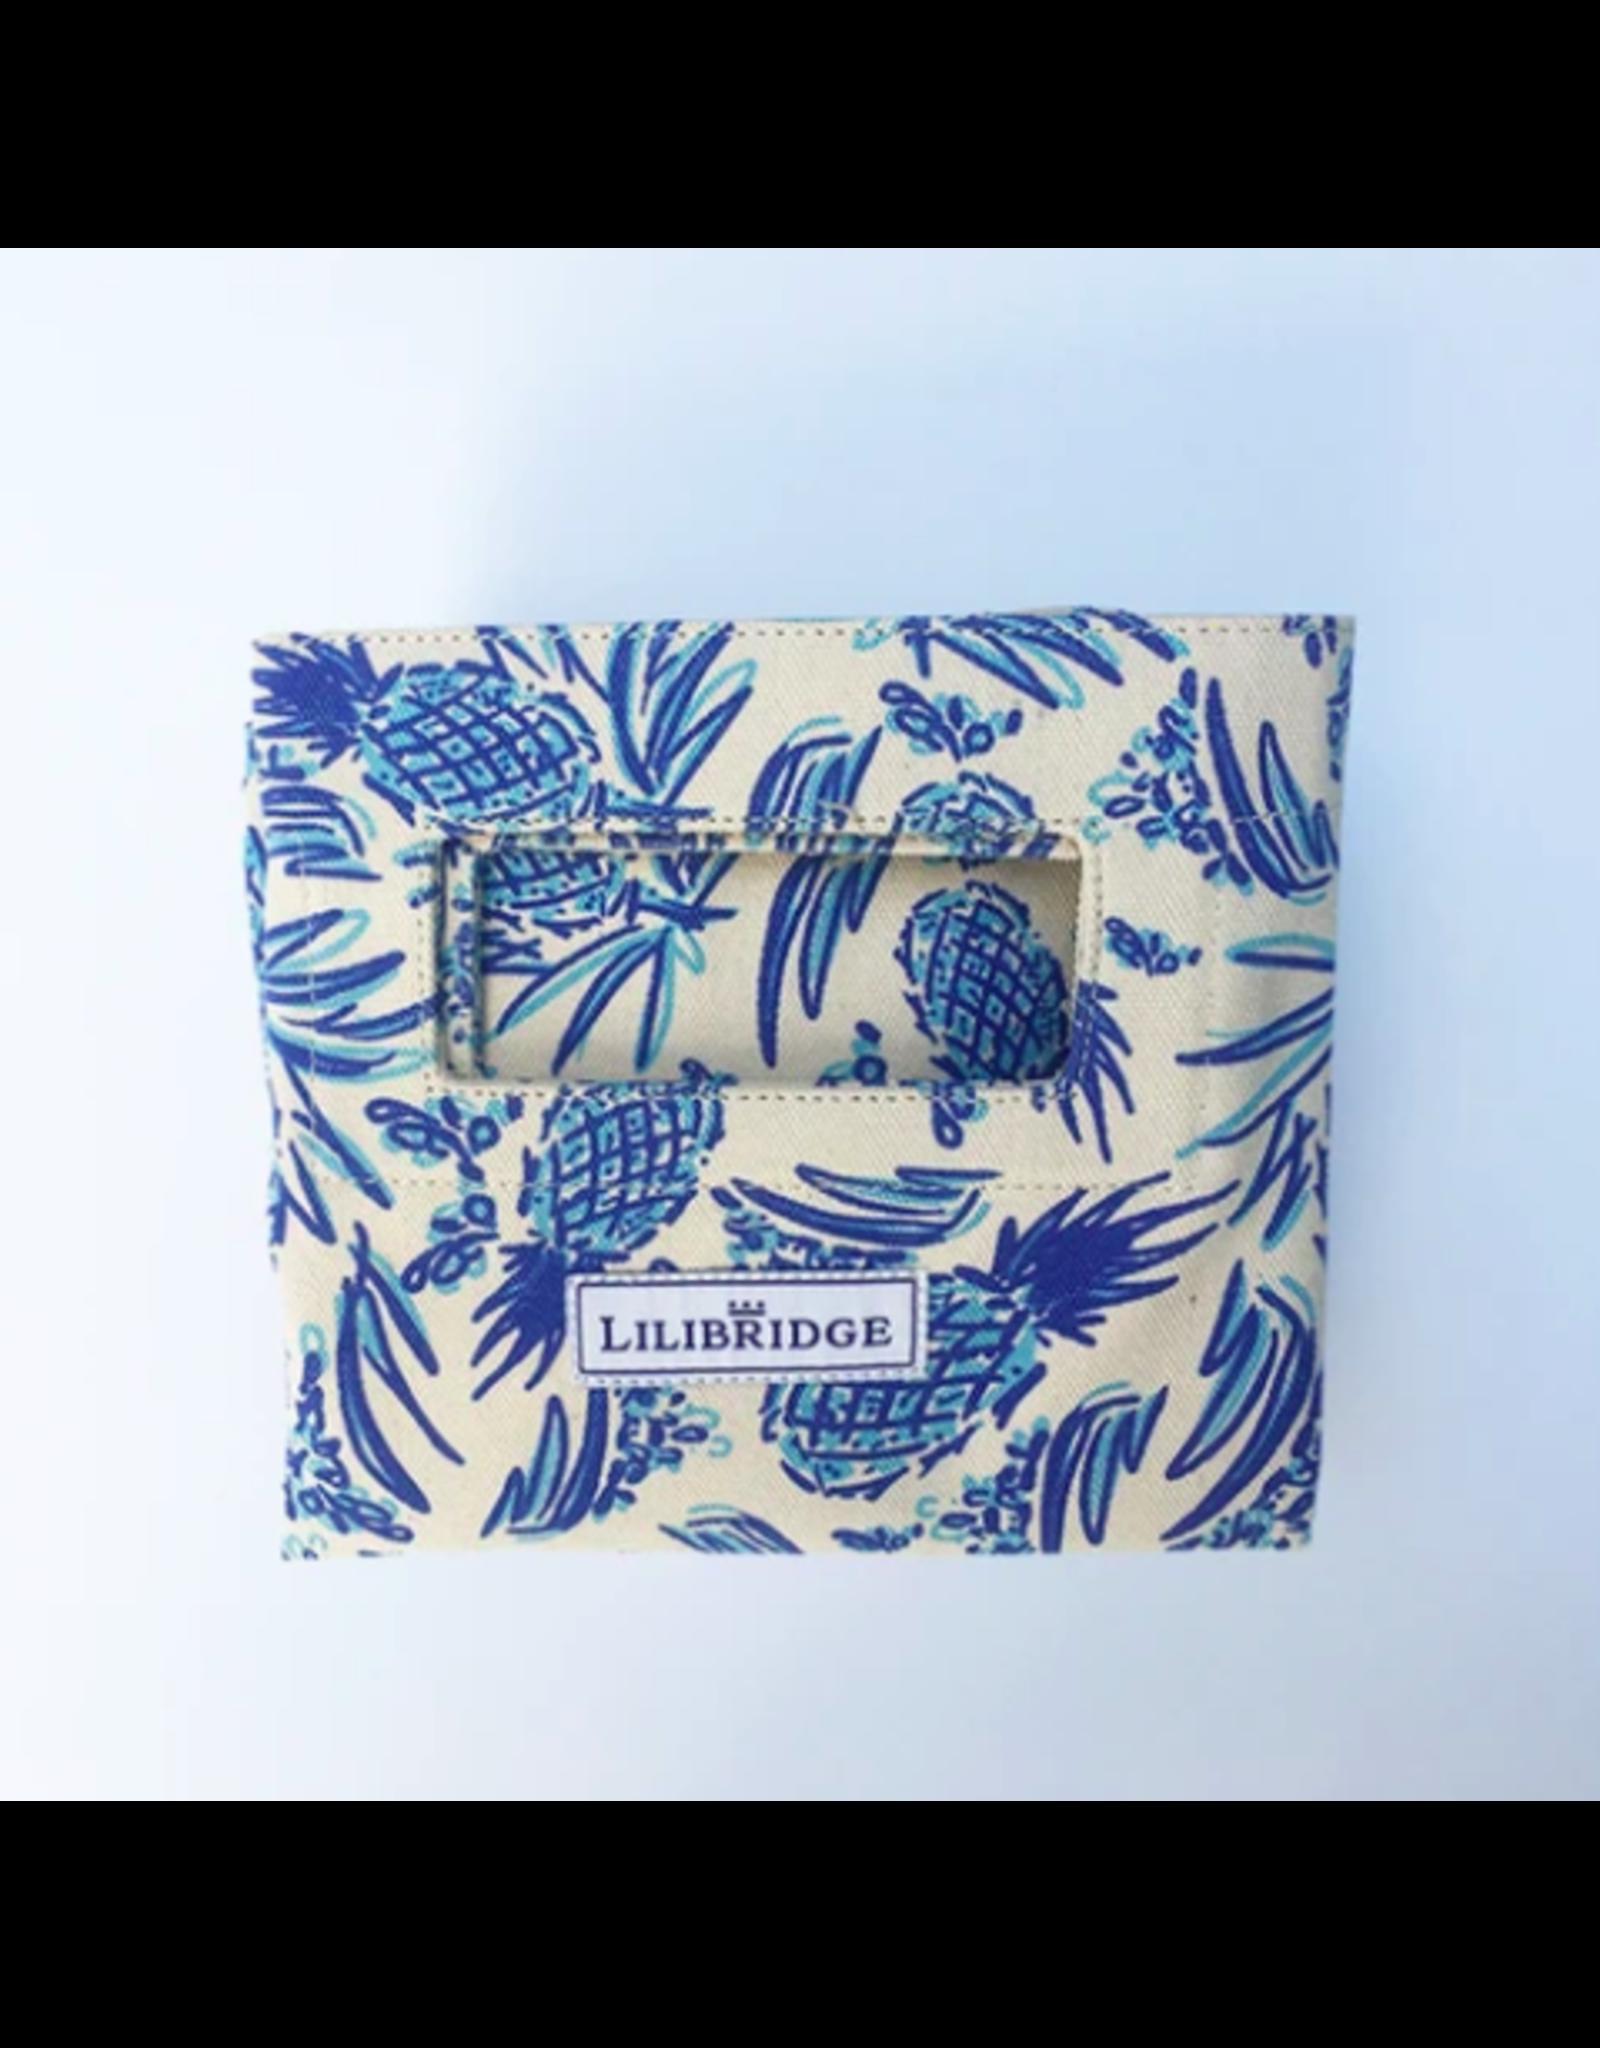 Lilibridge Blue Pineapple Bag by Lilibridge